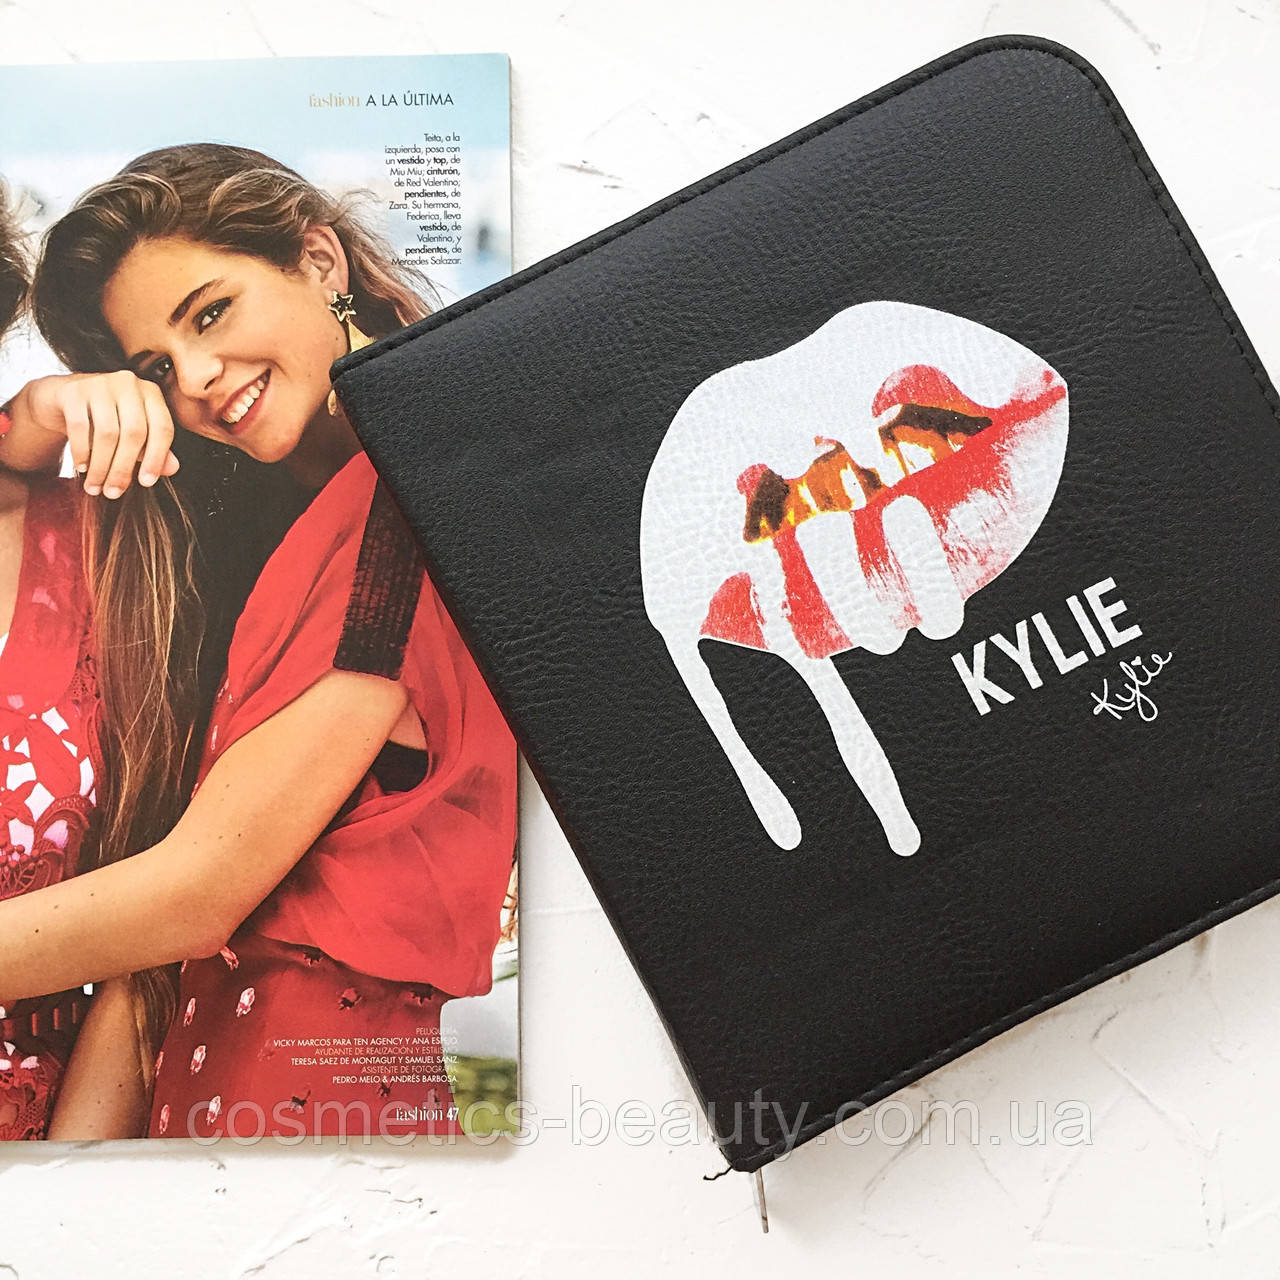 Кисти для макияжа в кейсе Kylie.